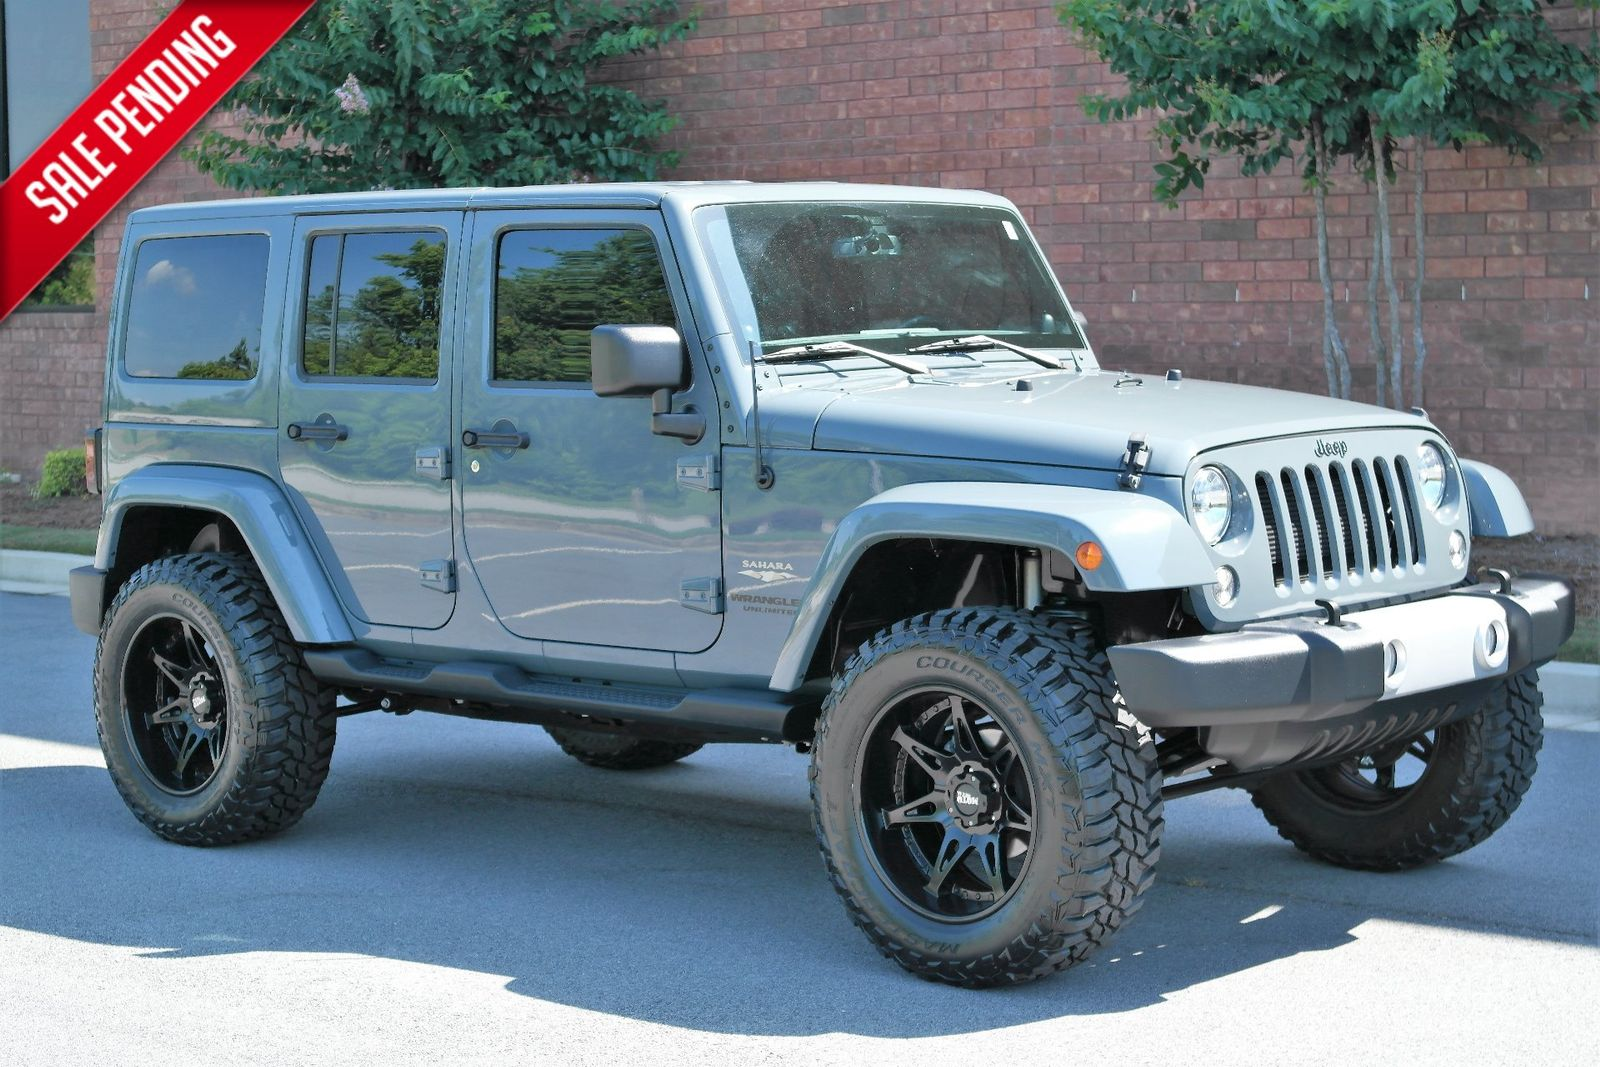 hight resolution of 2014 jeep wrangler unlimited sahara flowery branch ga lakeside motor company llc in flowery branch